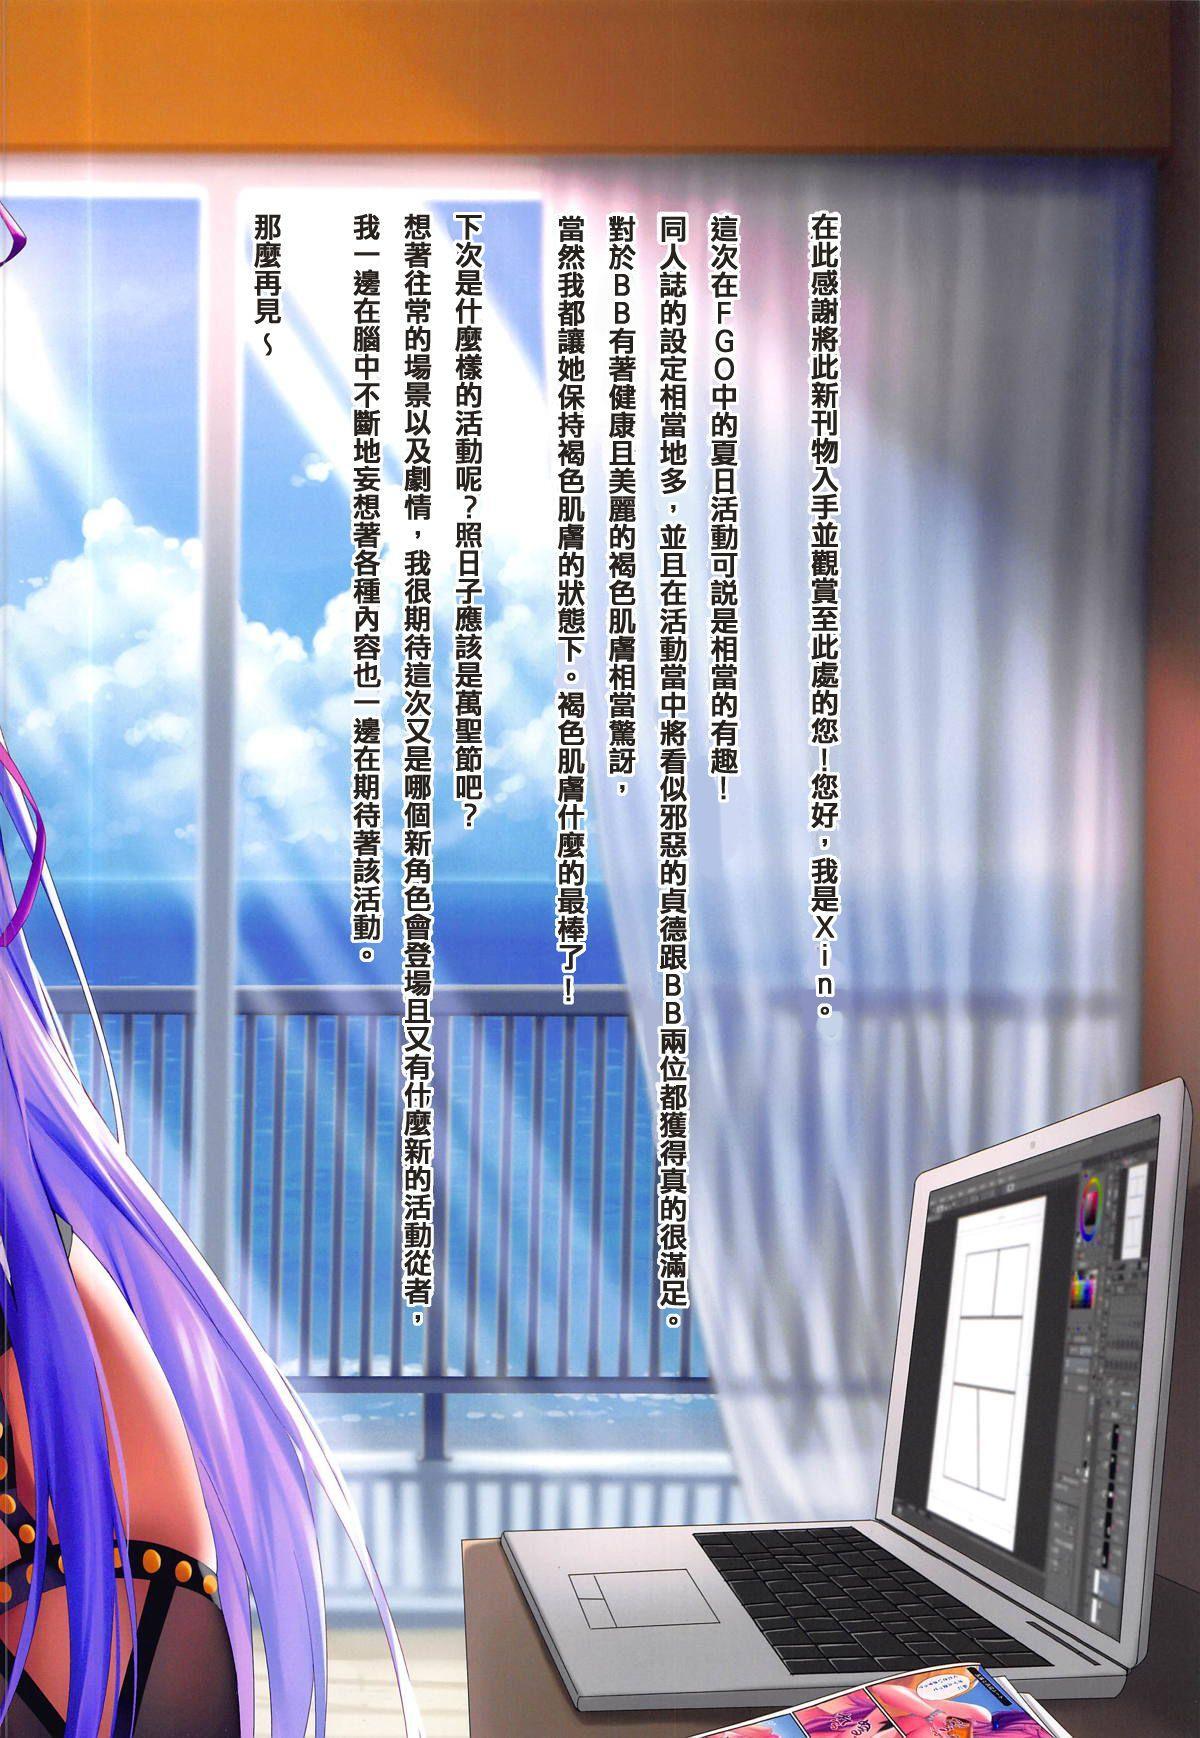 (COMIC1☆14) [Moe Hime Rengou (xin, obiwan)] FGO Carnival 19 - Kyuukyoku no C.C.C. Namaiki Kouhai-chan to Nama Lesson (Fate/Grand Order) [Chinese] [三日月TS私人漢化翻譯] 22